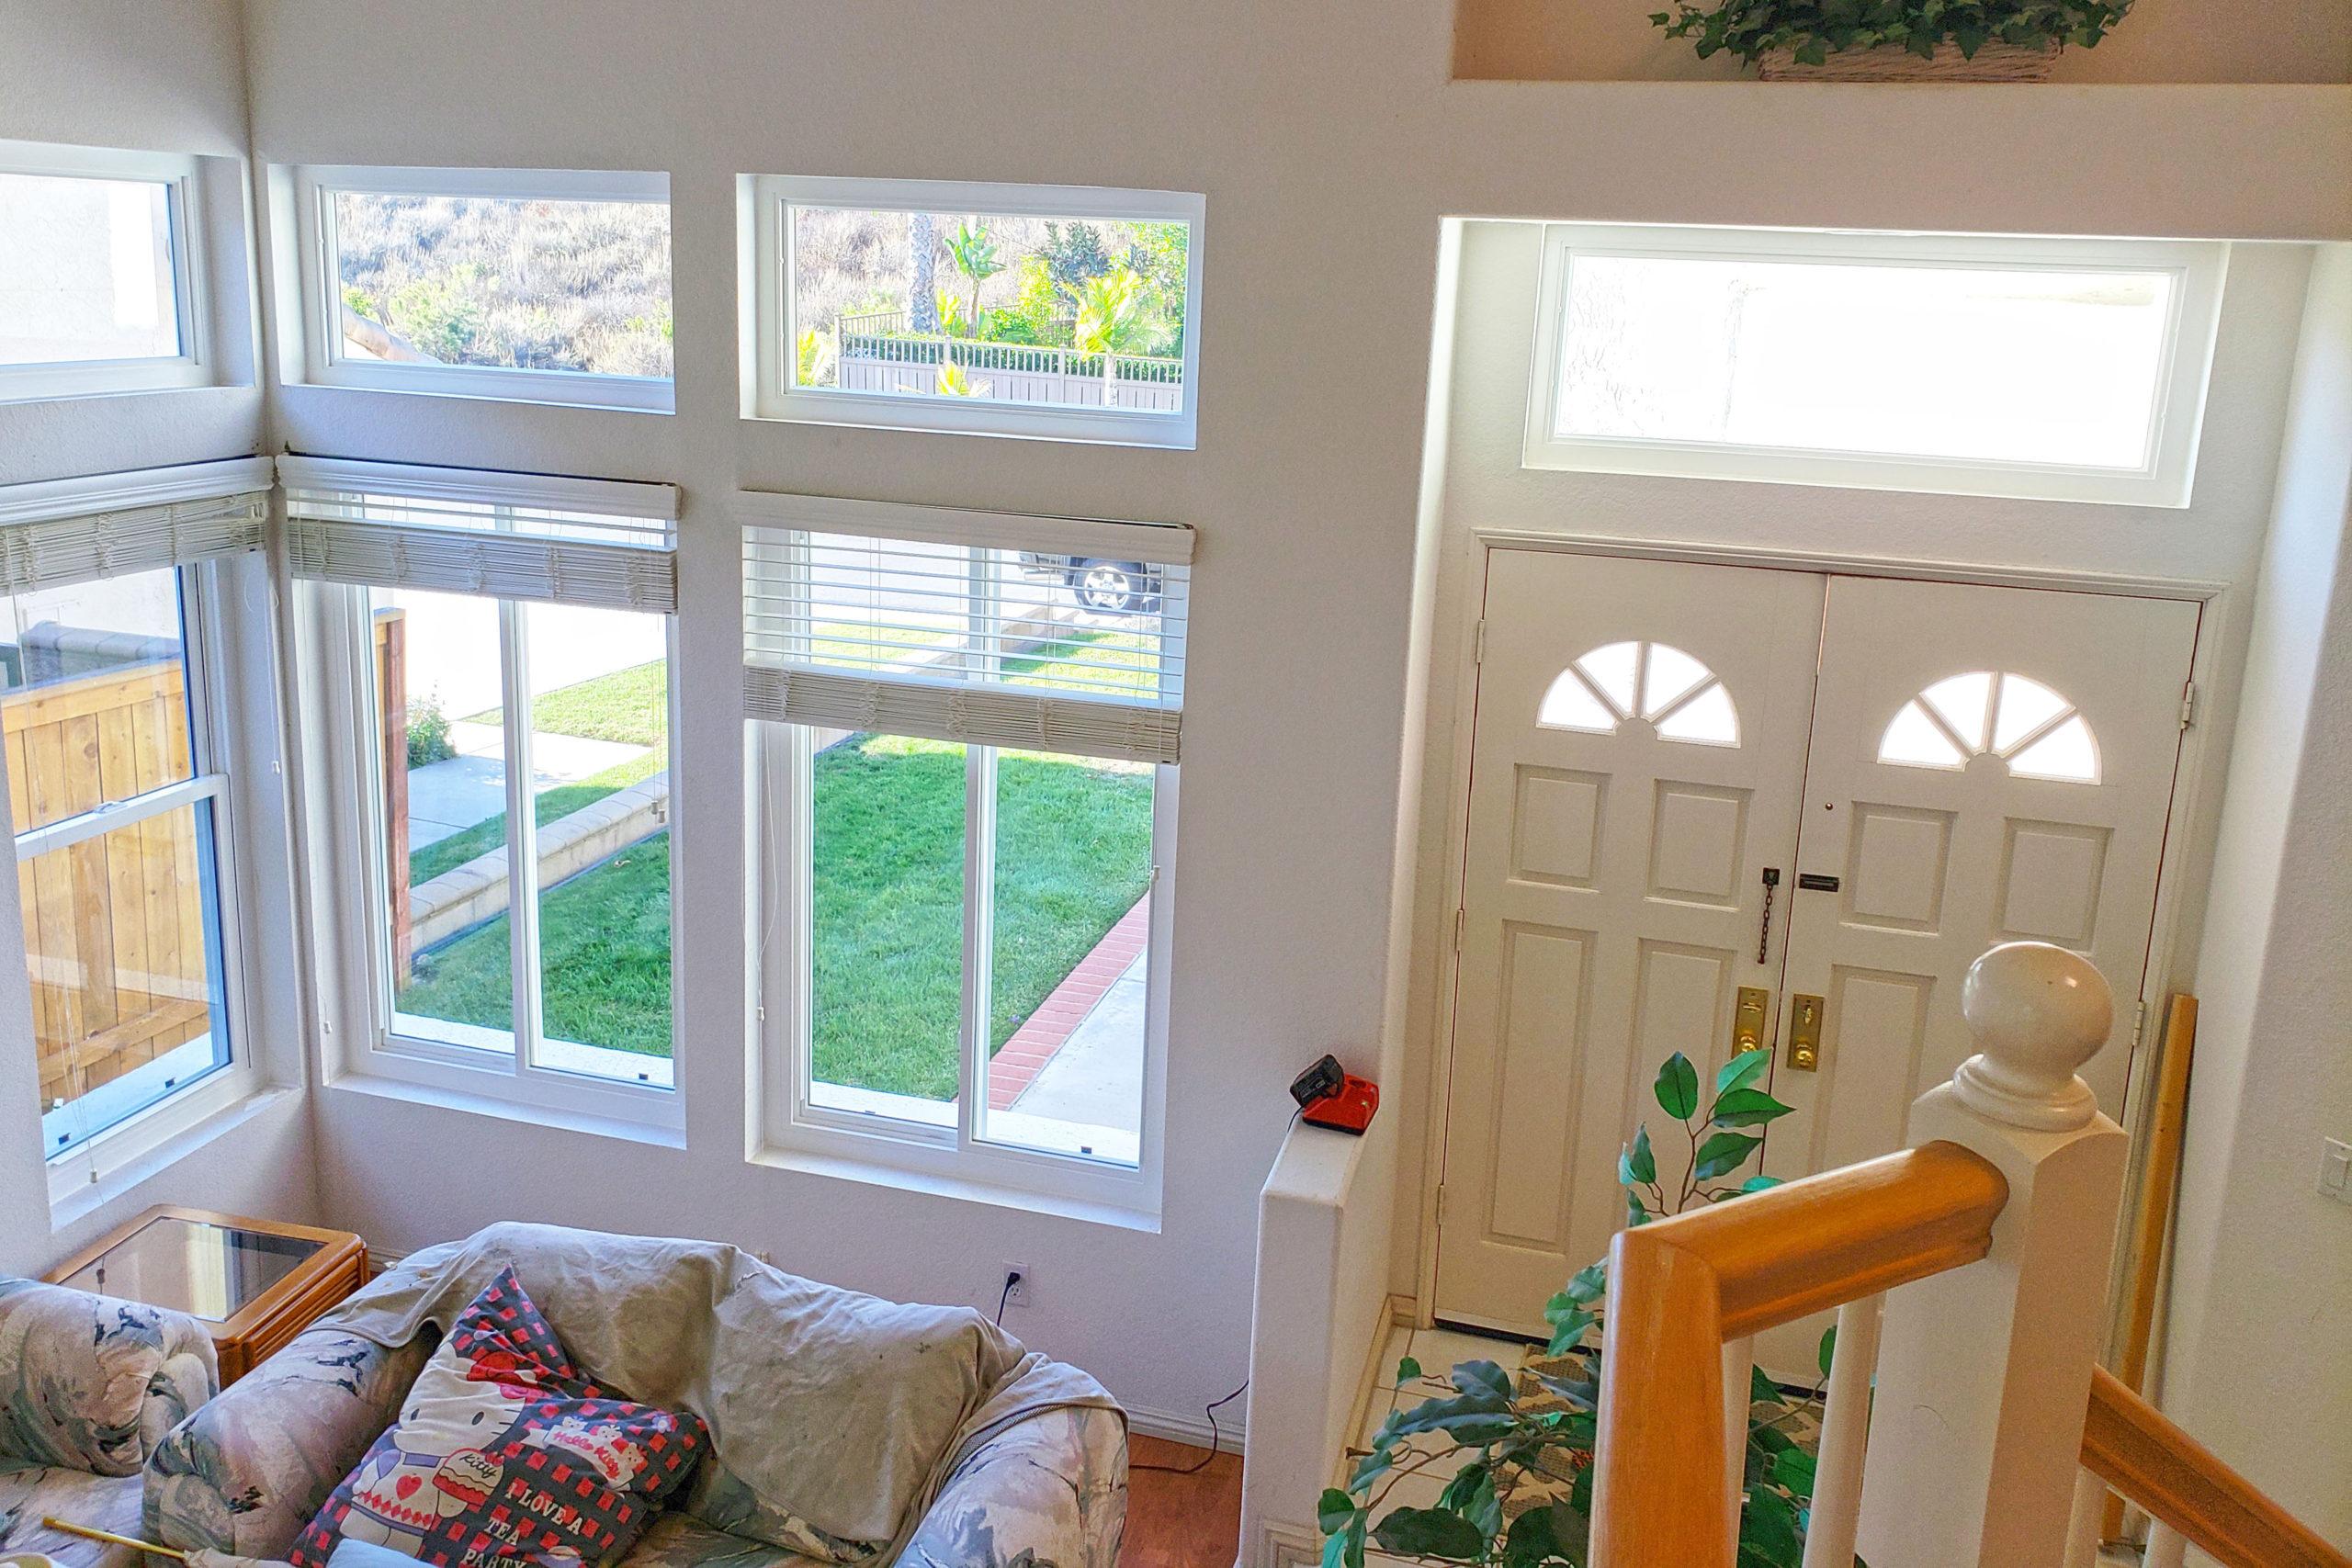 anlin windows inside